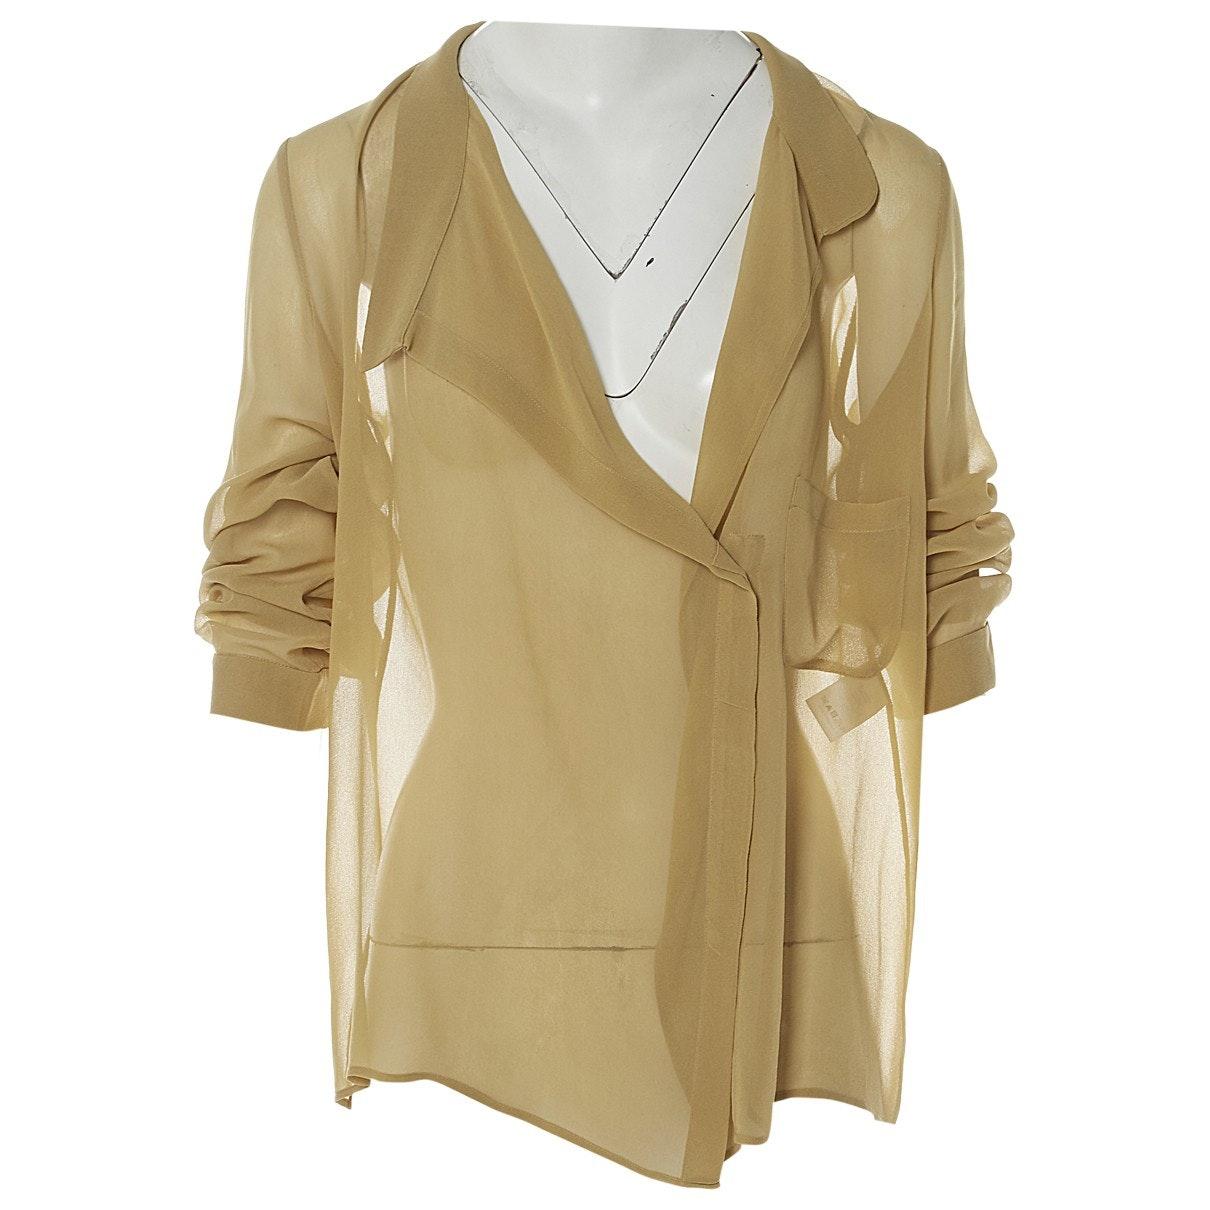 VANESSA BRUNO Nude Silk Blouse; Size: 38 FR; $175.63